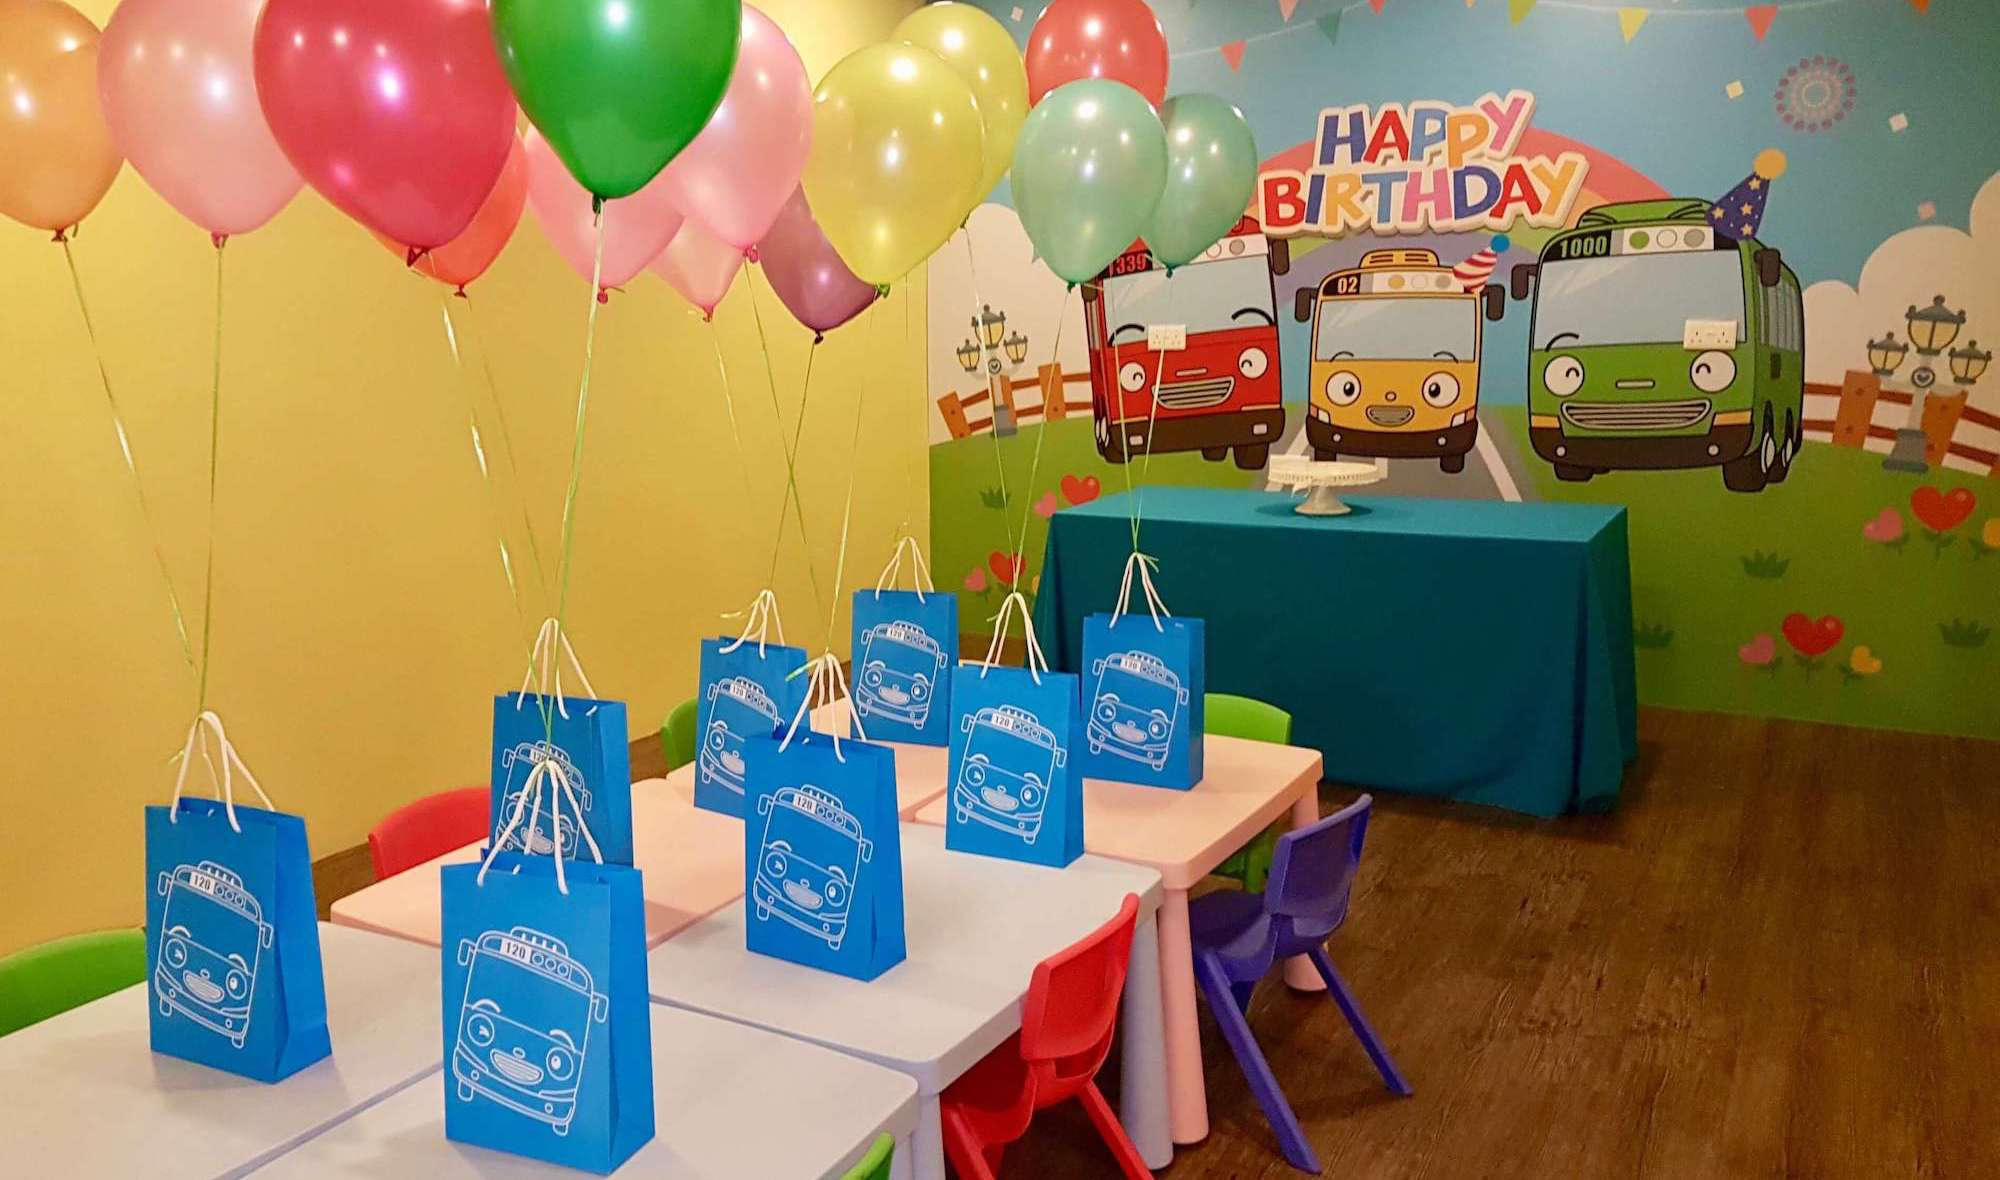 Birthday Package At Tayo Station